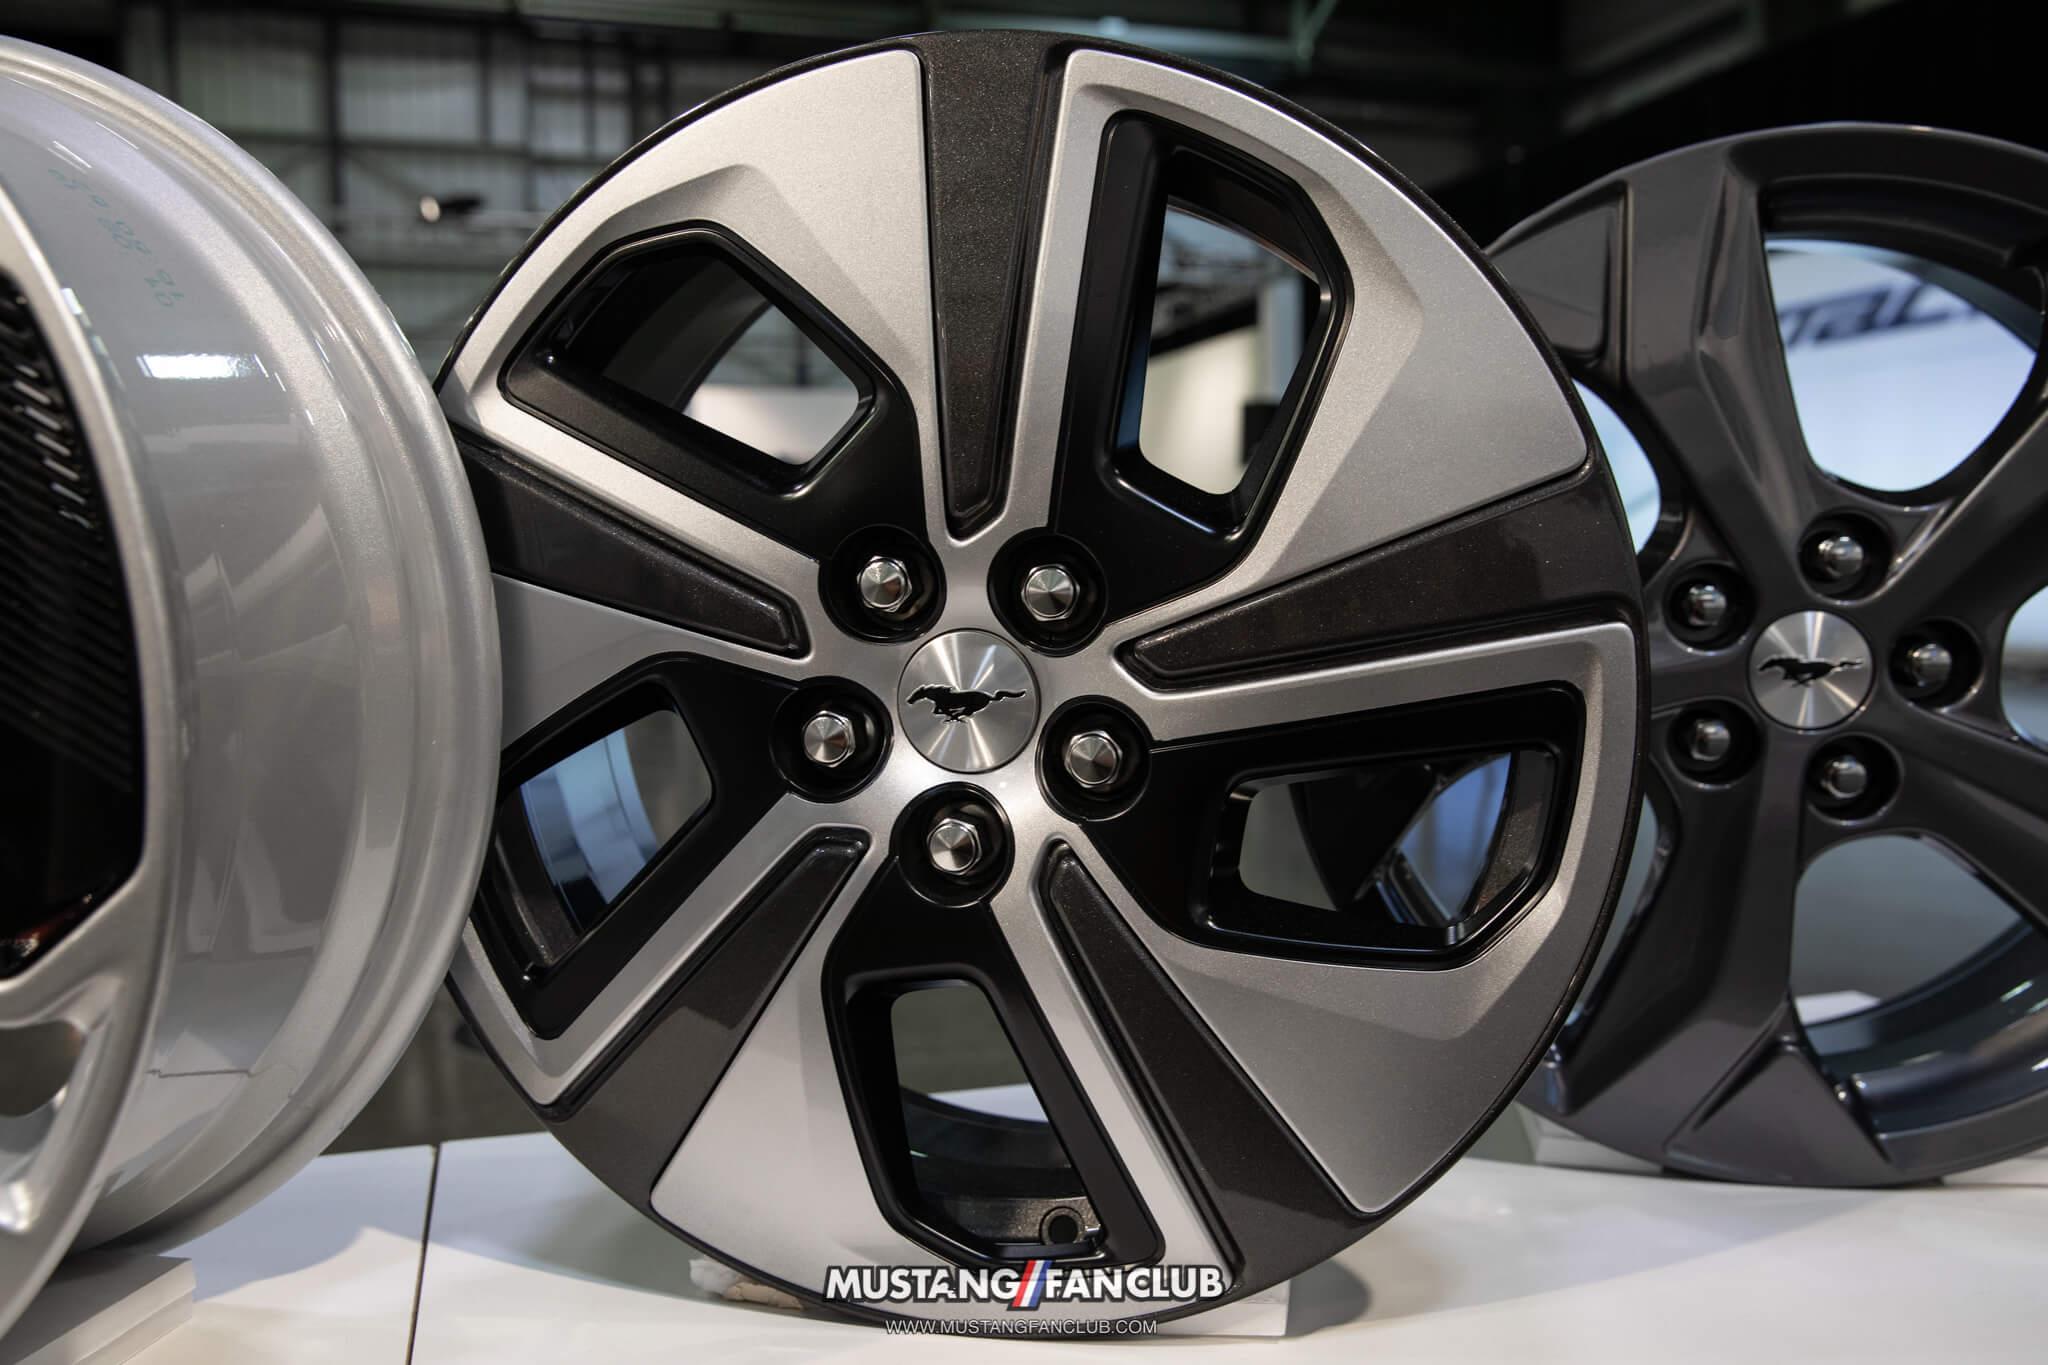 "18"" High Gloss Black Aluminum Wheels w/ Low Gloss Black Aero Cover"